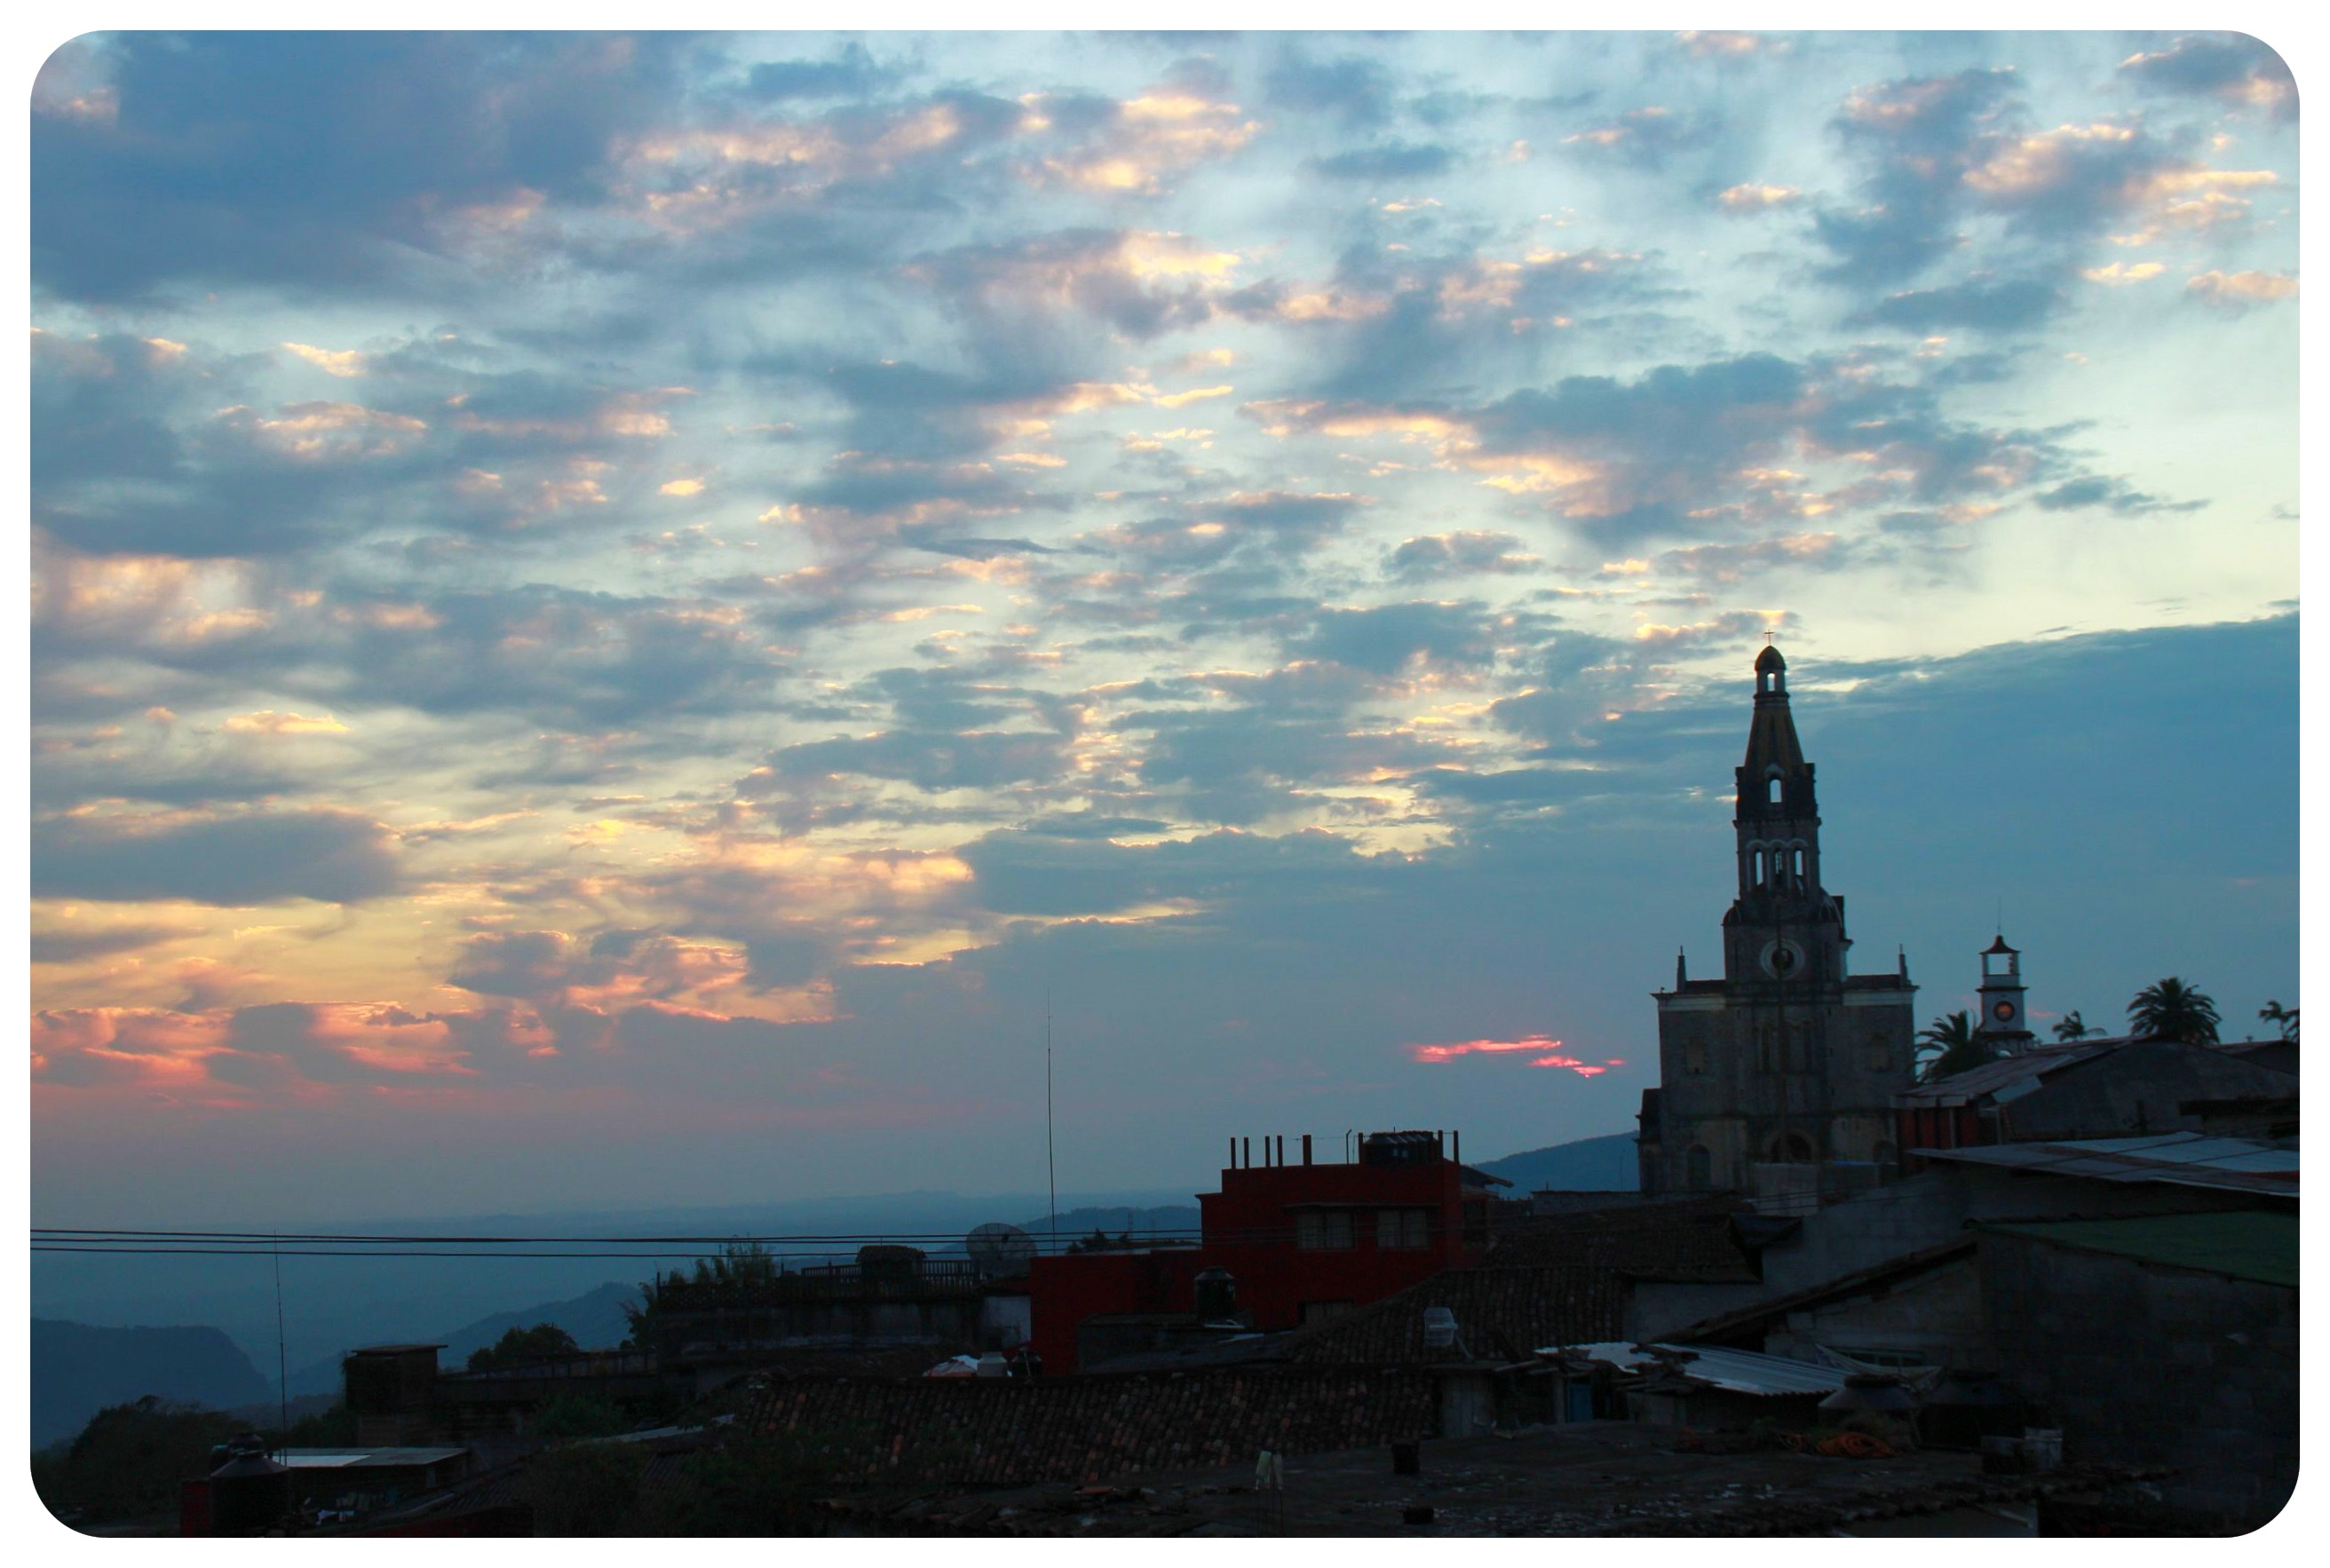 cuetzalan sunrise